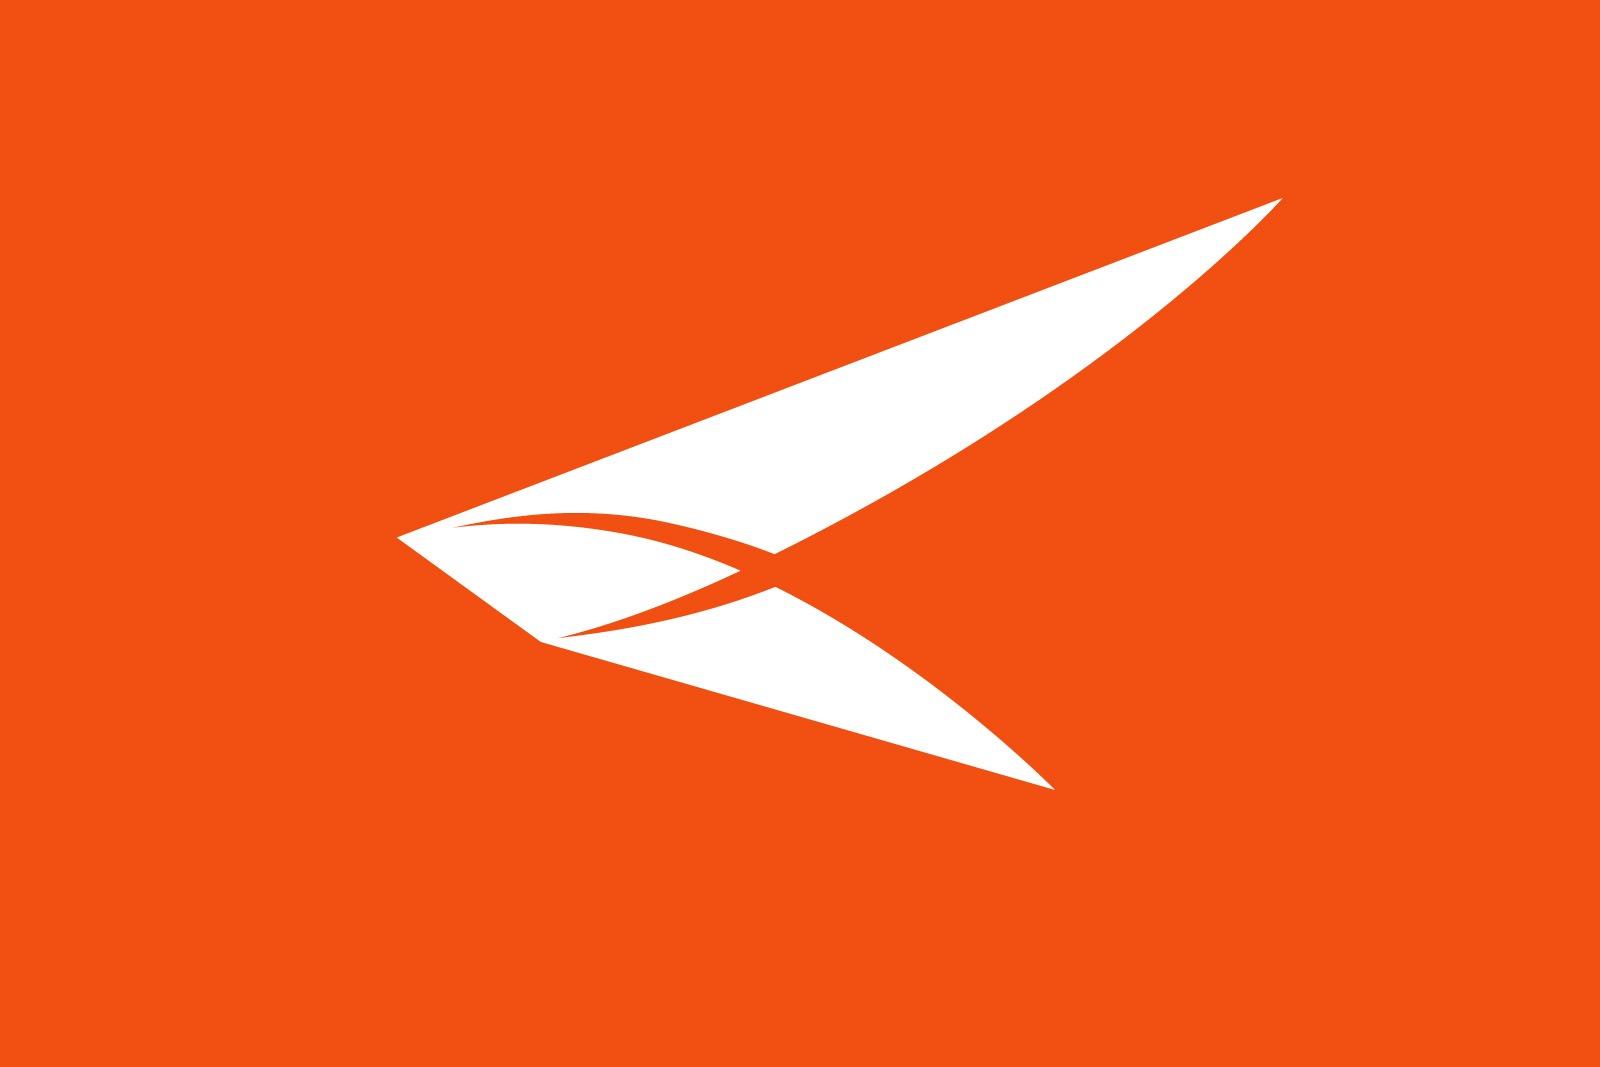 Авиакомпания Азимут, белый логотип на оранжевом фоне, Azimuth Airline logo, Asgard Branding